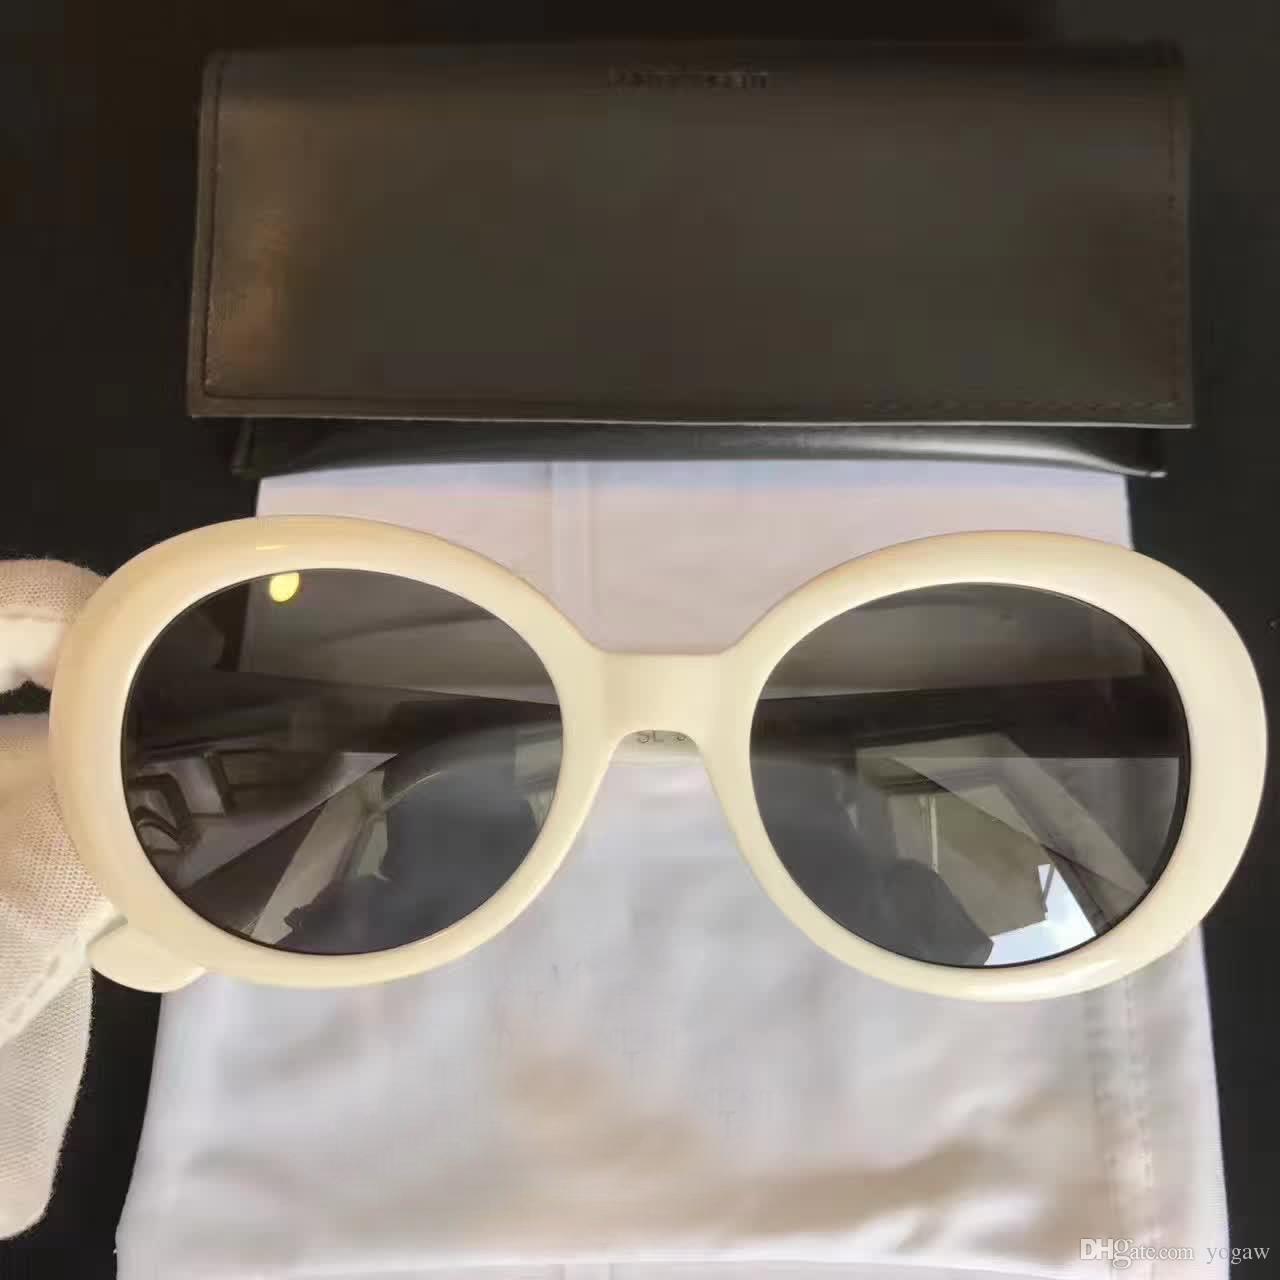 c38608ae03 Unisex California Surf Sunglasses SLP Hedi Slimane SL 98 SURF White Grey  Fashon Sunglass SL 98 Men Brand Sunglasses Brand New With Box Glasses For Men  Mens ...